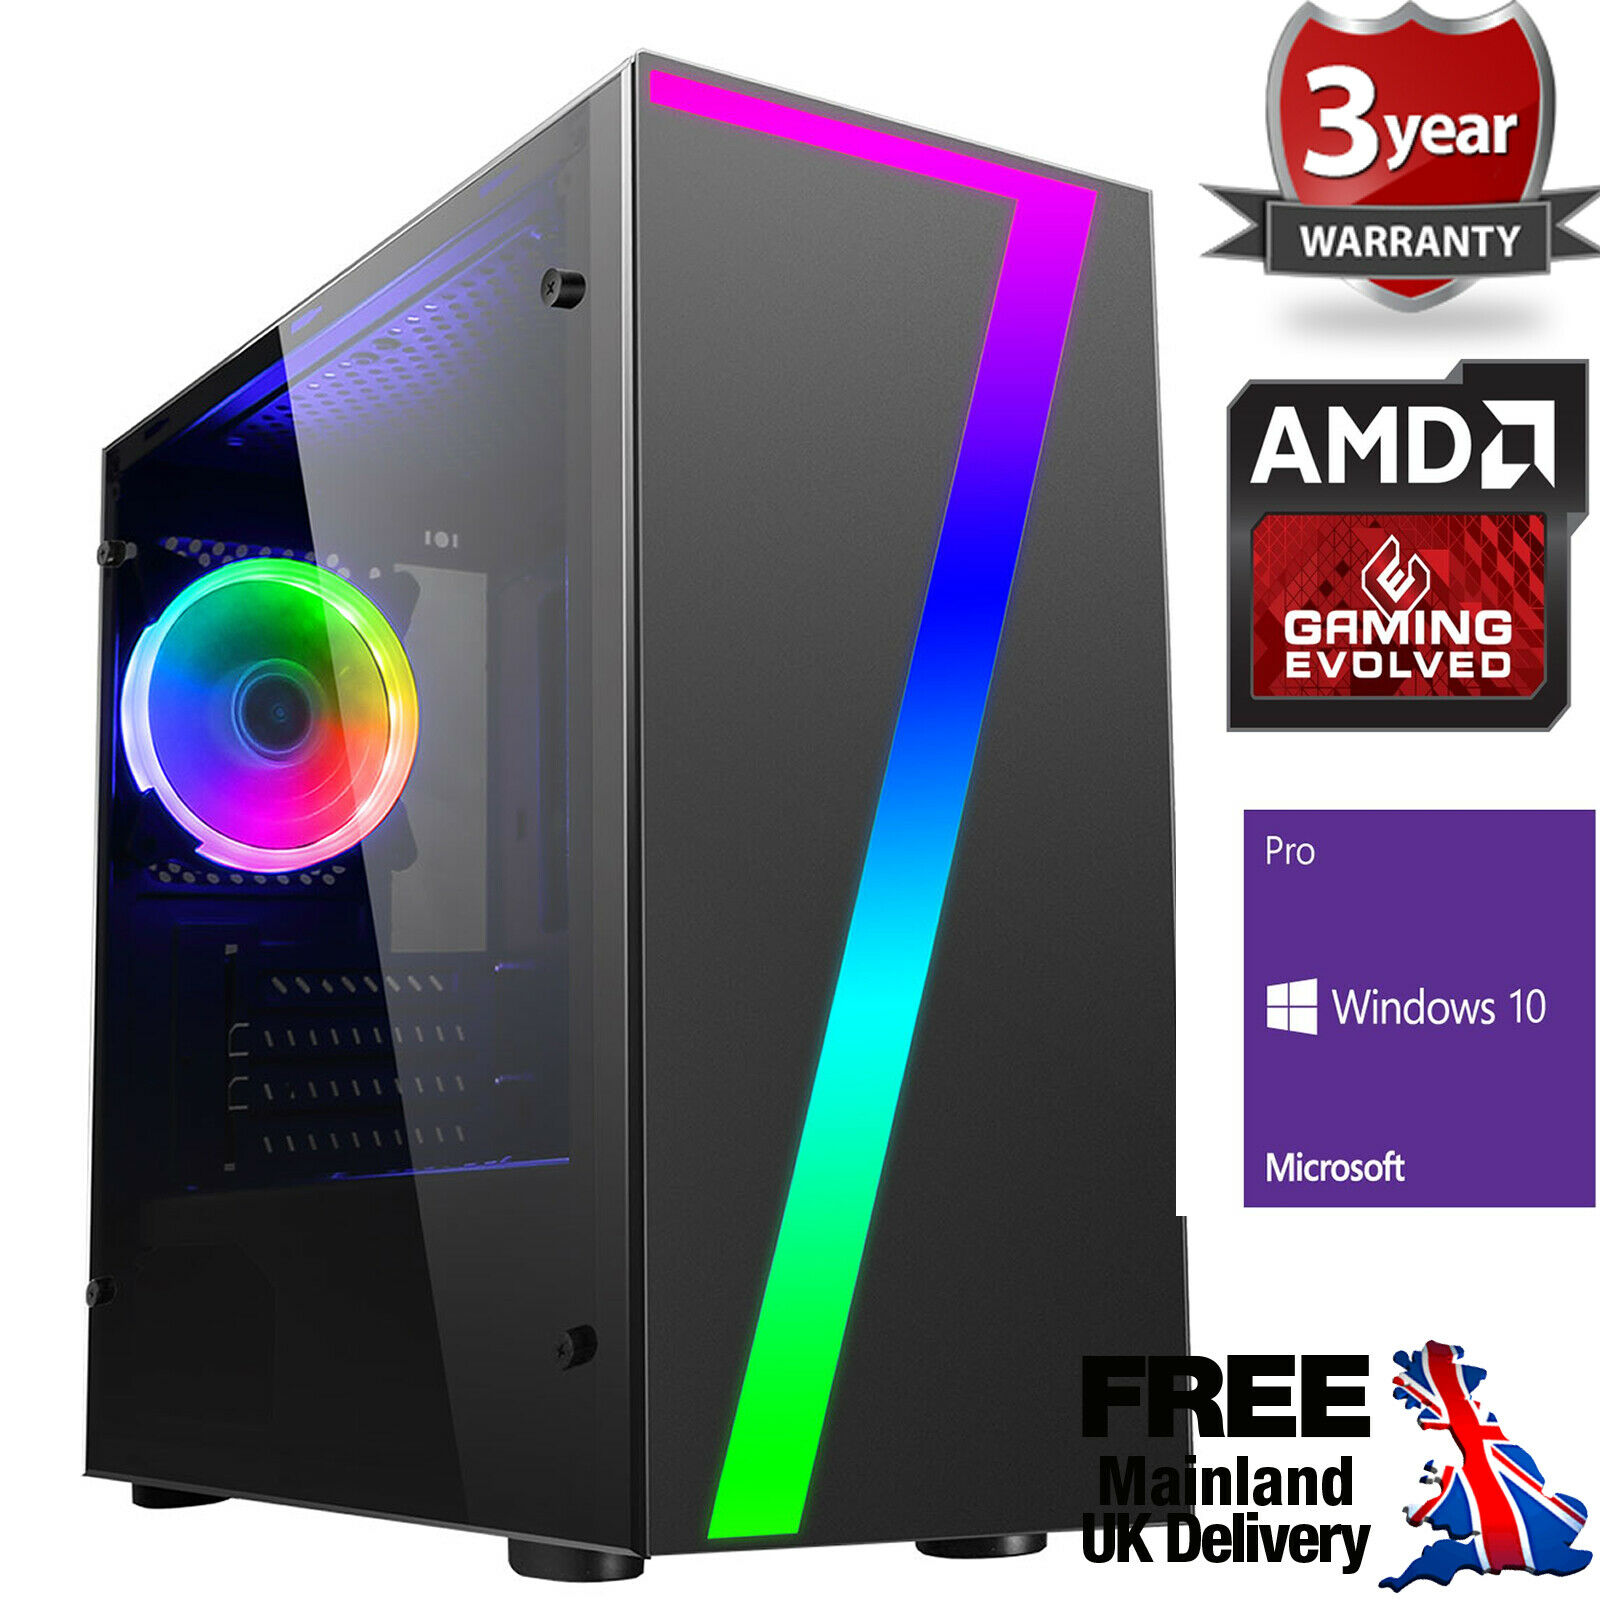 Computer Games - Gaming PC Quad Core Computer SSD HDD 8-16 GB RAM GT GTX GFX Windows 10 WiFi OW7